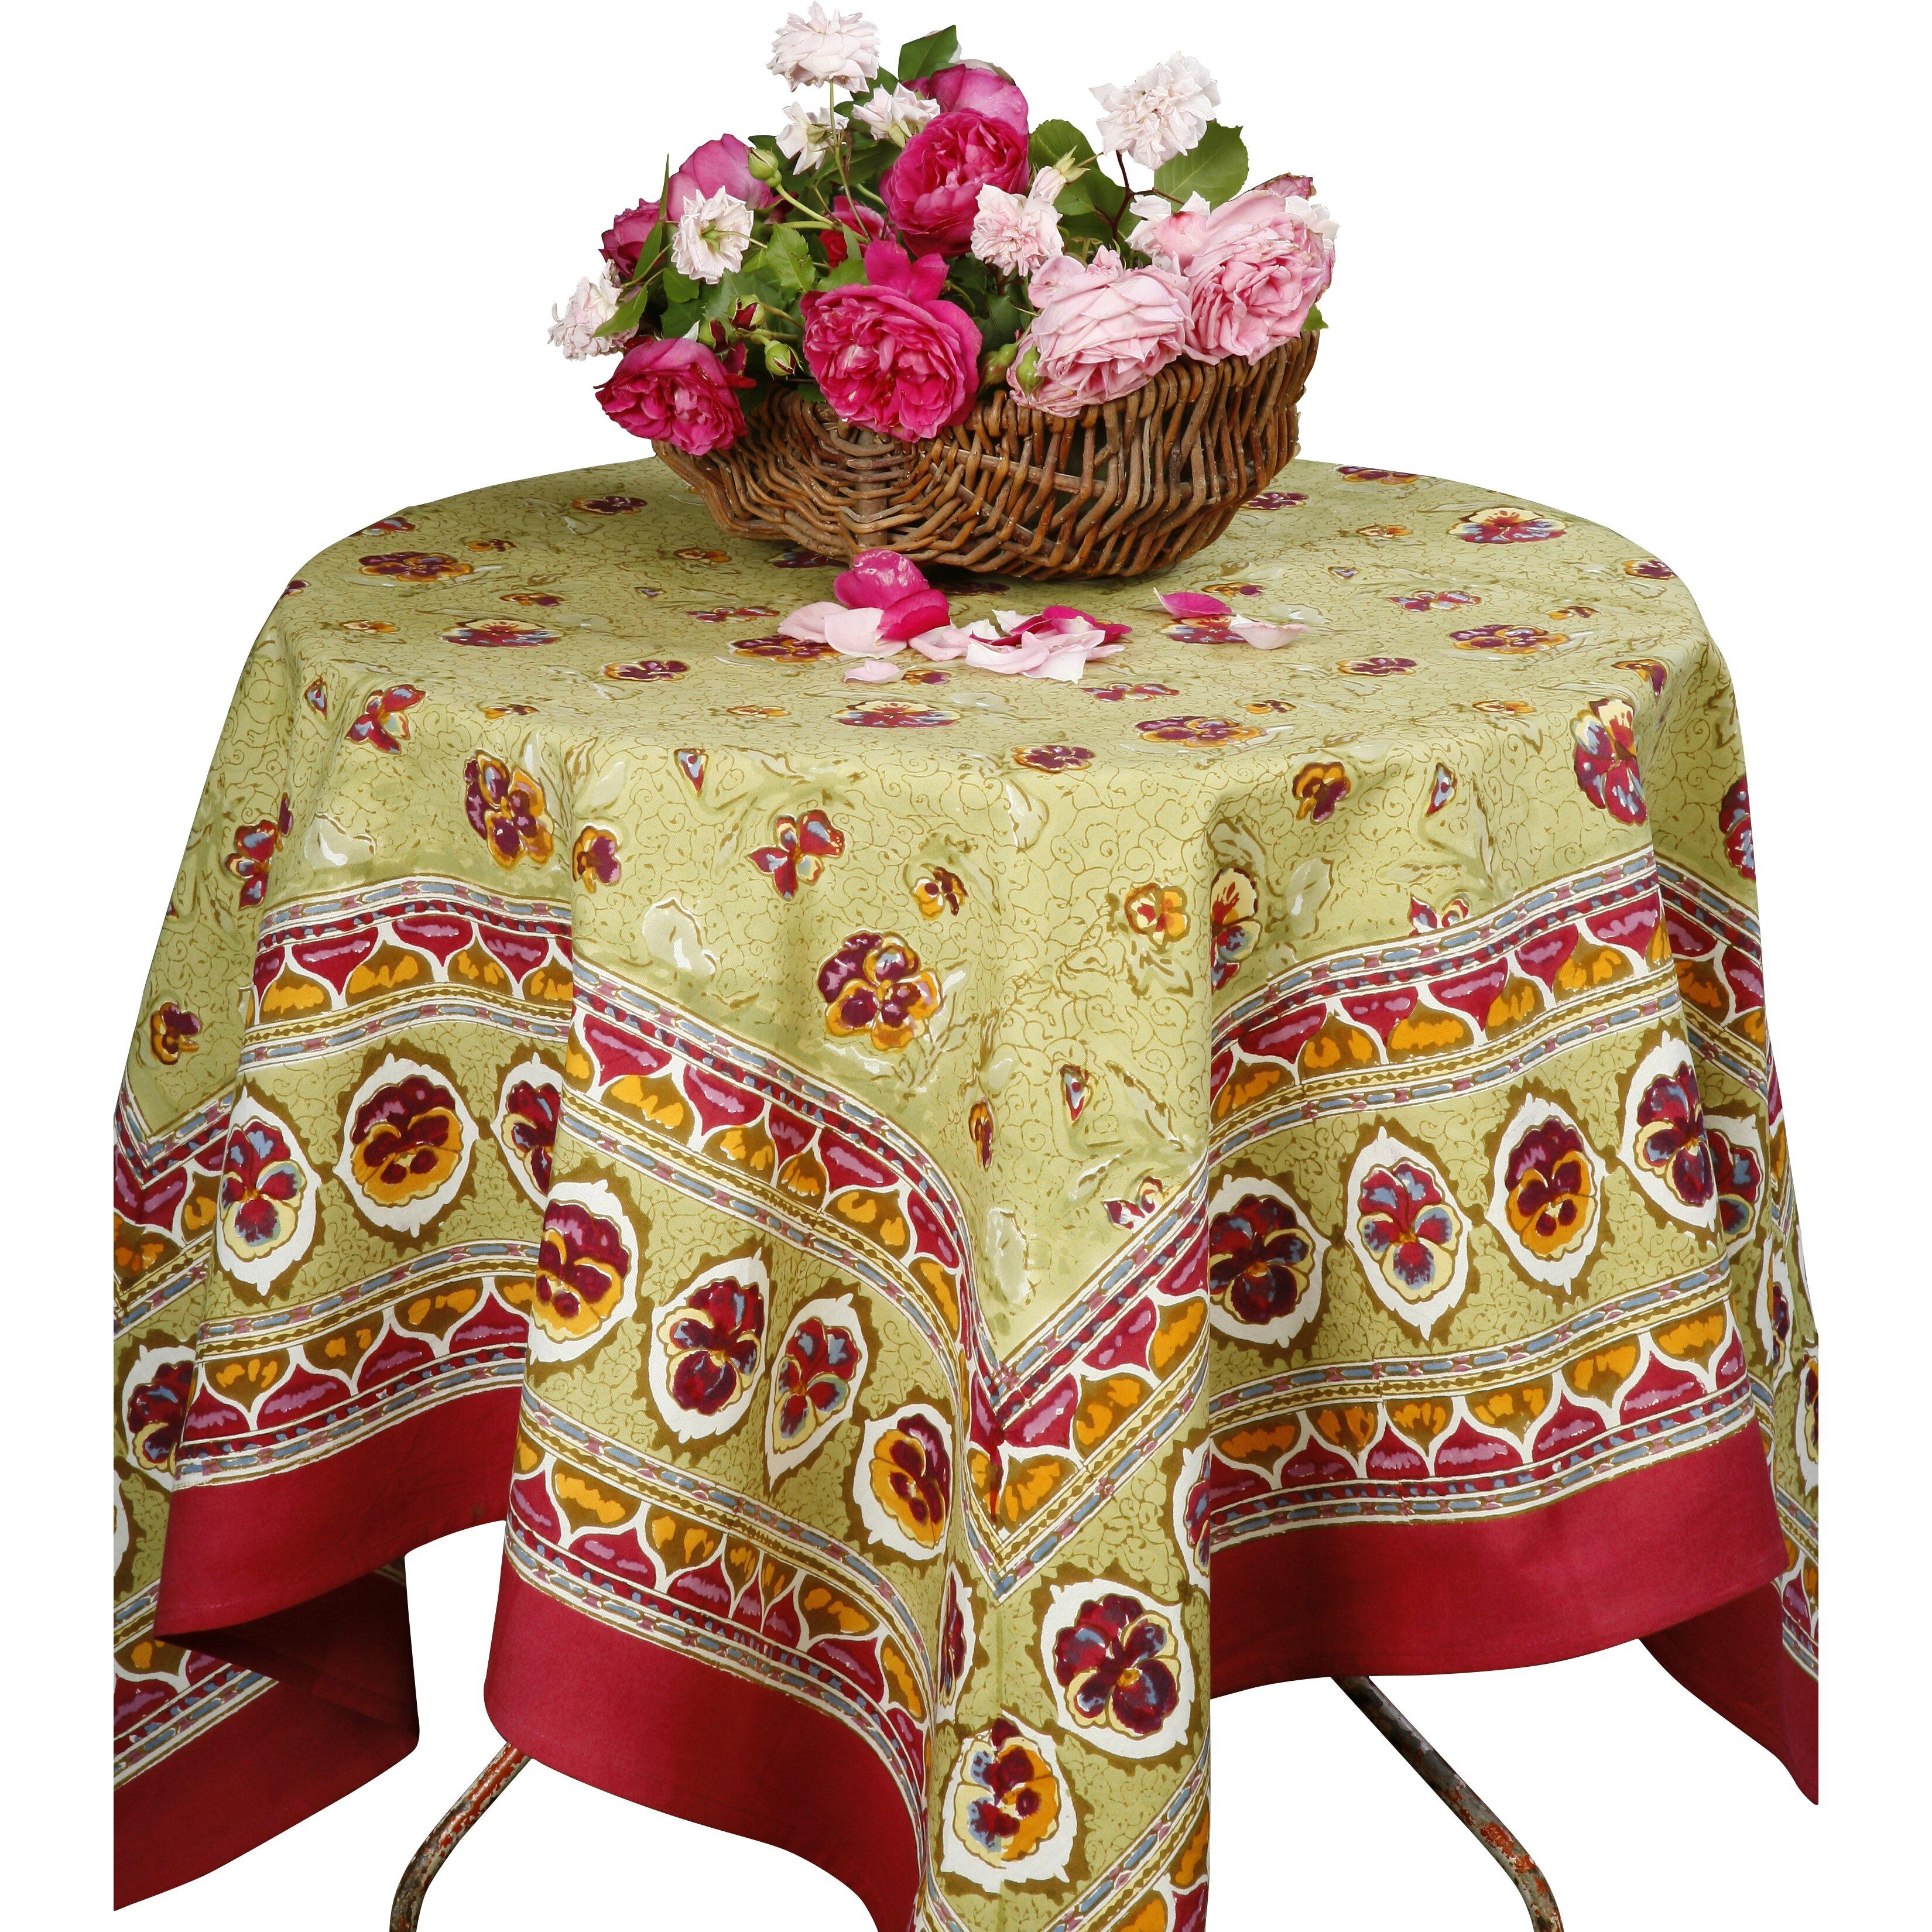 couleur nature pansy tablecloth wayfair. Black Bedroom Furniture Sets. Home Design Ideas